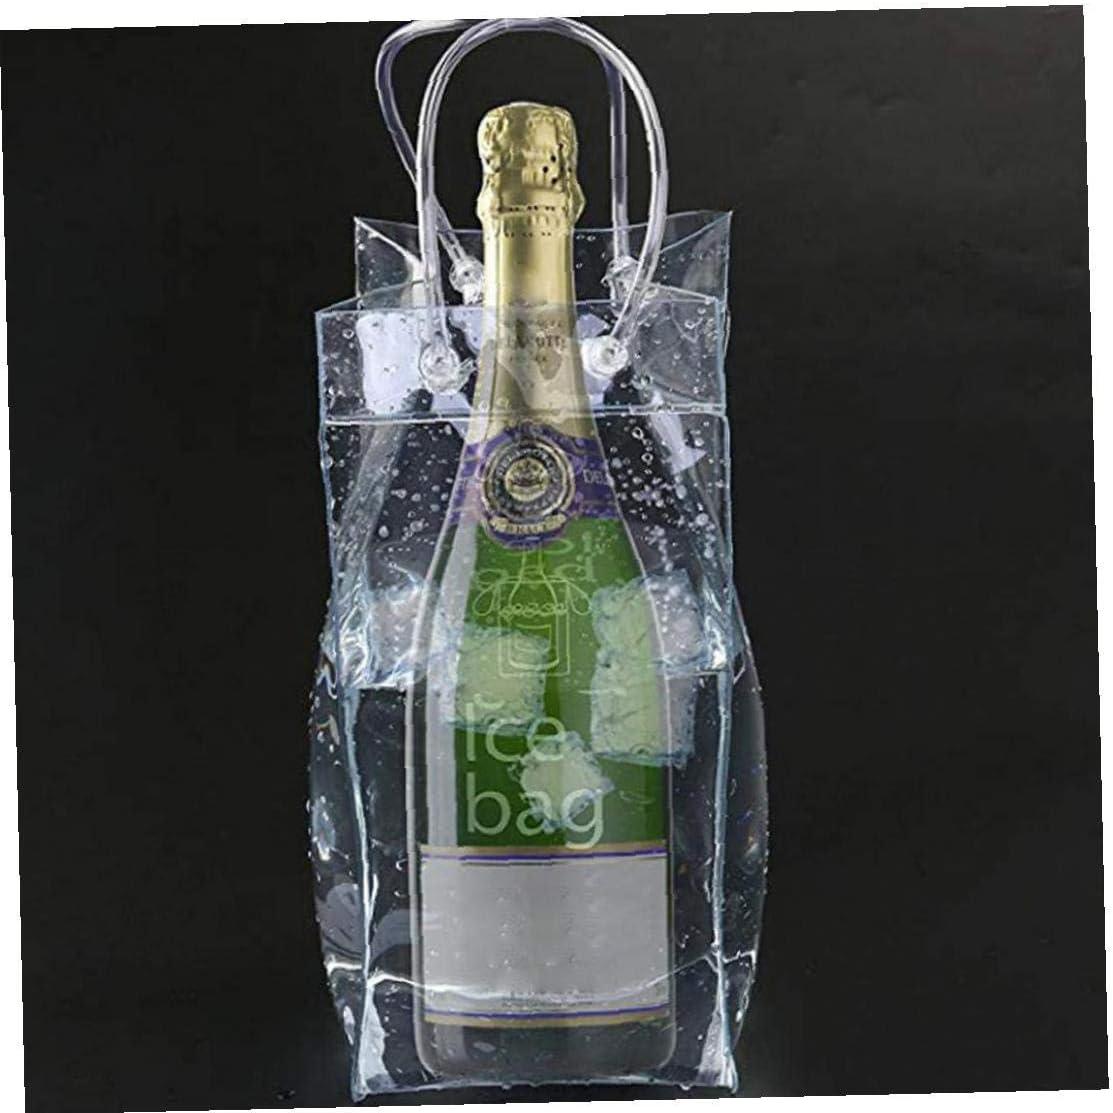 Vino 2pcs Hielo Bolsa Port/átil Plegable De PVC Transparente Claro De Hielo Bolsa Bolso M/ás Fresco con Mango De Vino Blanco Champagne Cerveza Fr/ía